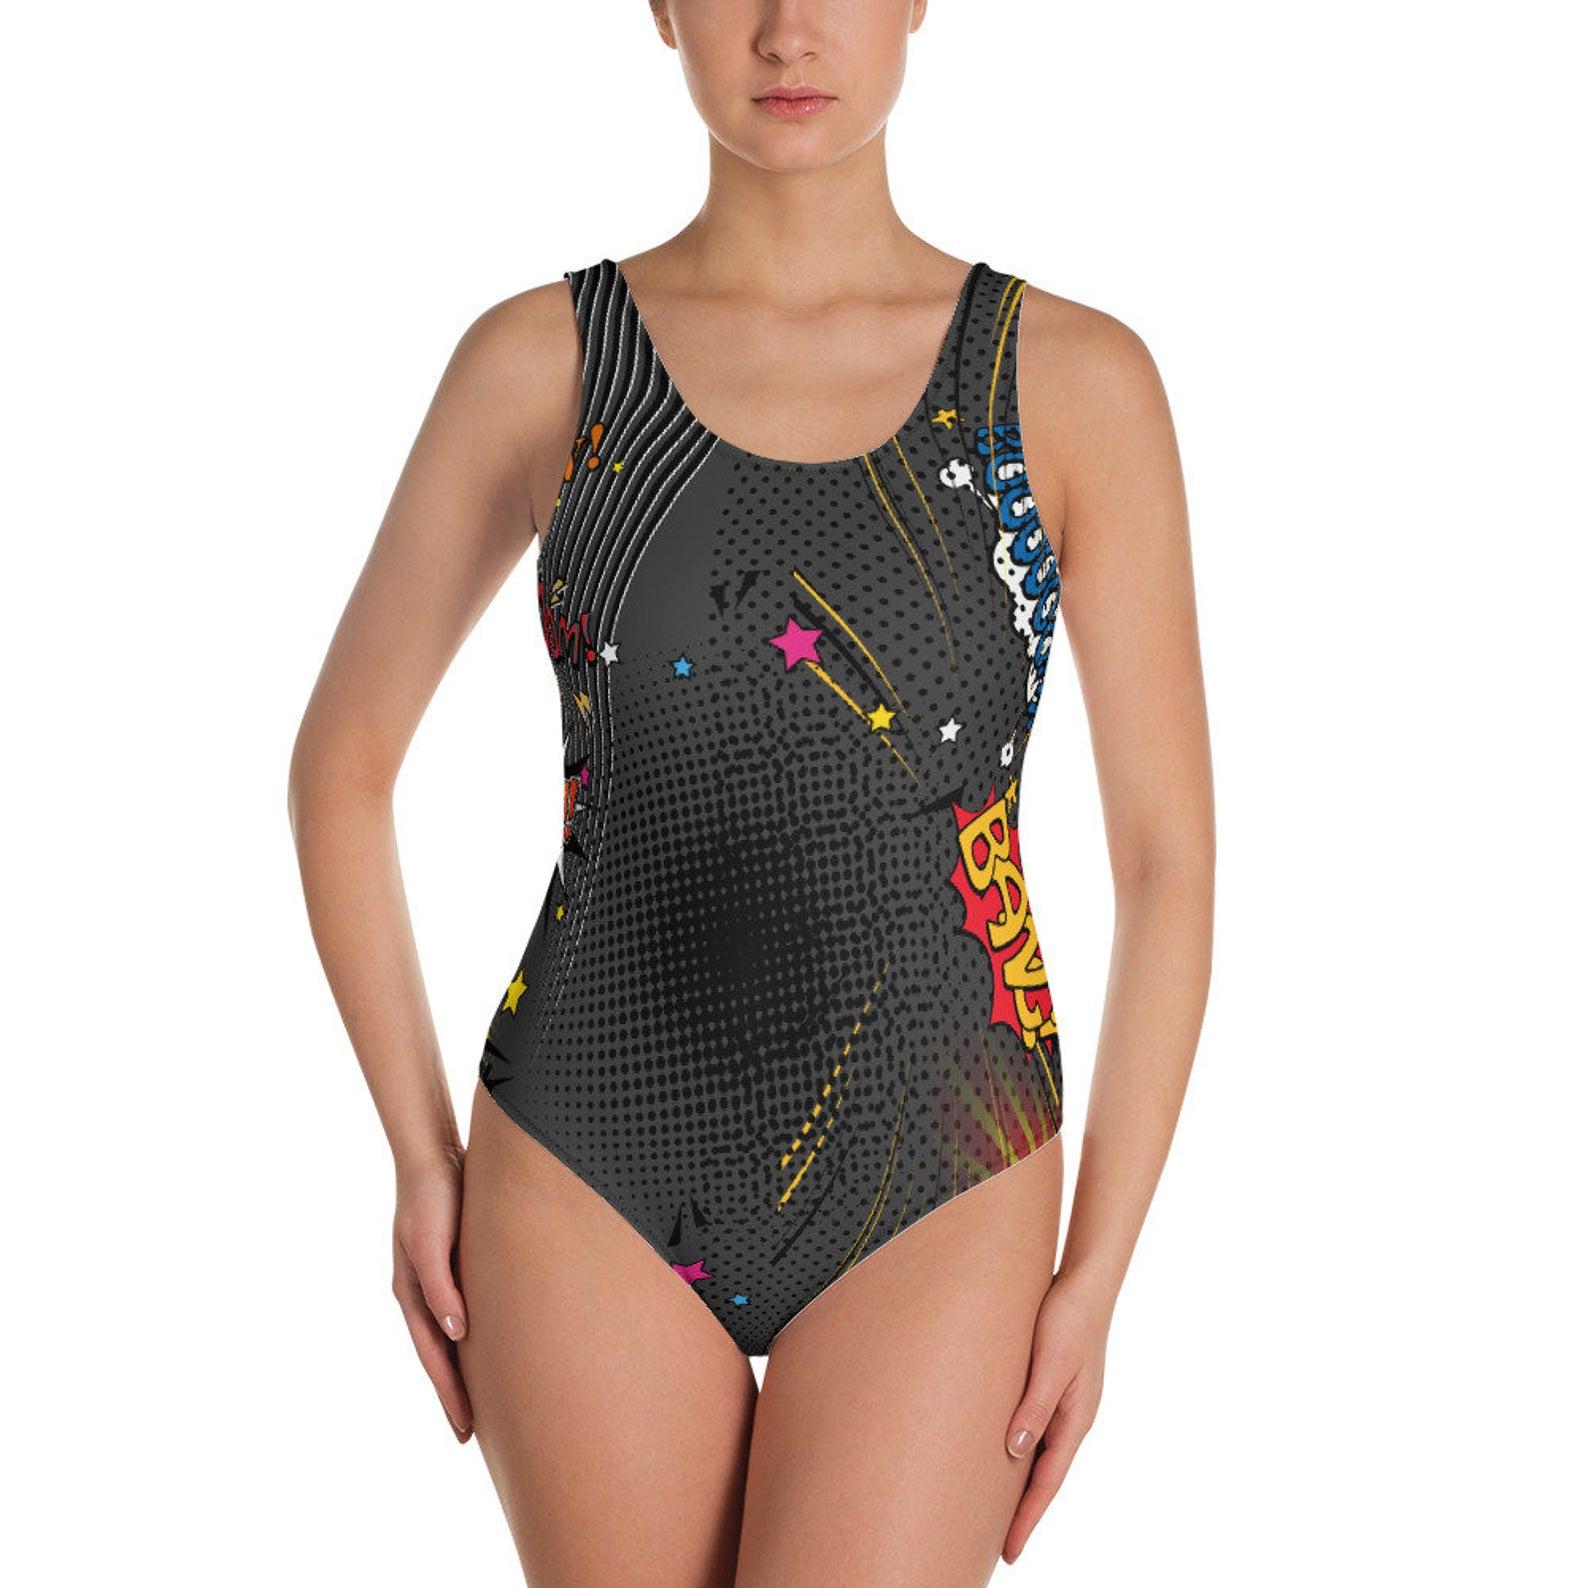 Nerdy Swimsuits - Boom Splat